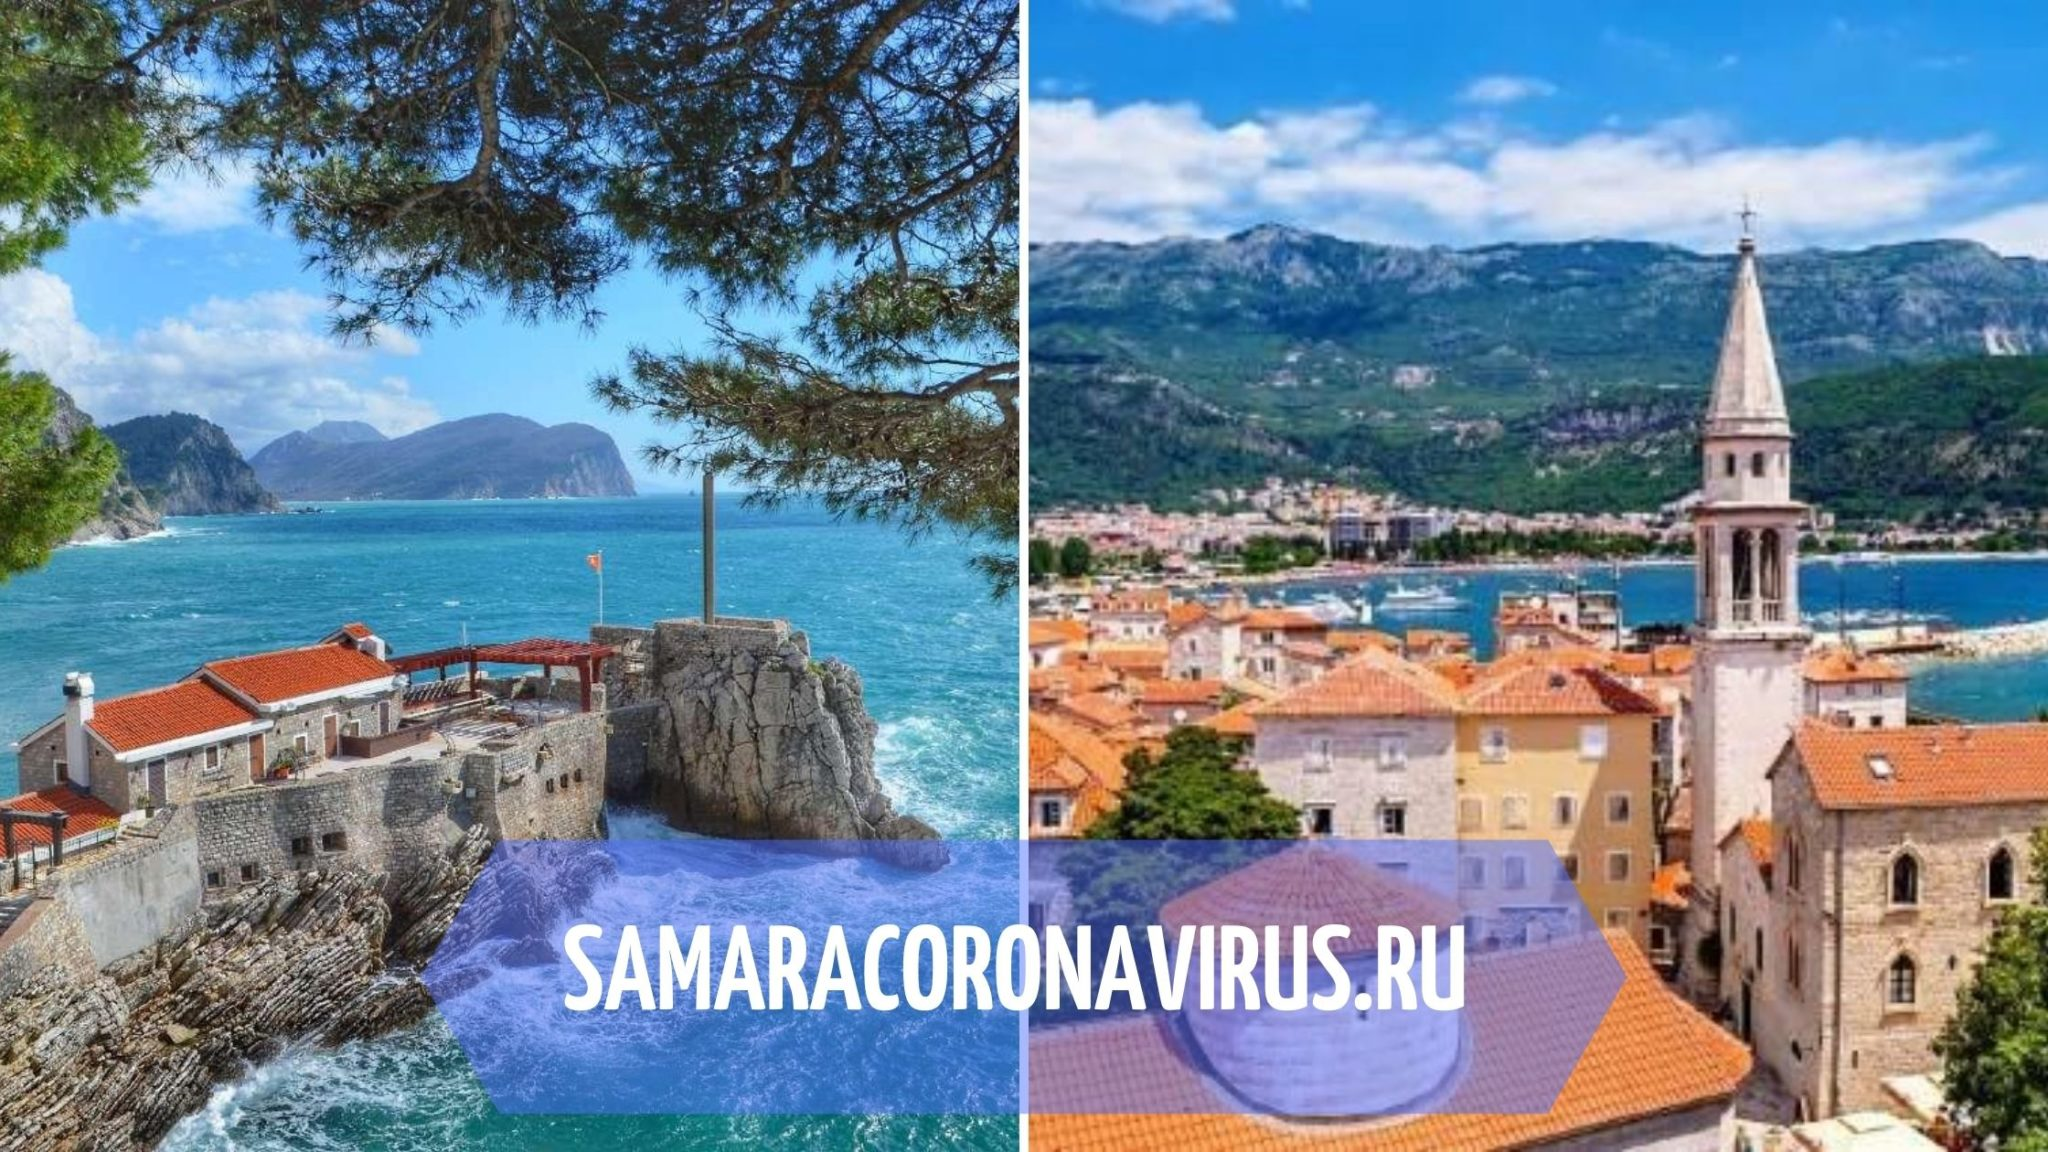 Ситуация с короновирусом в Черногории